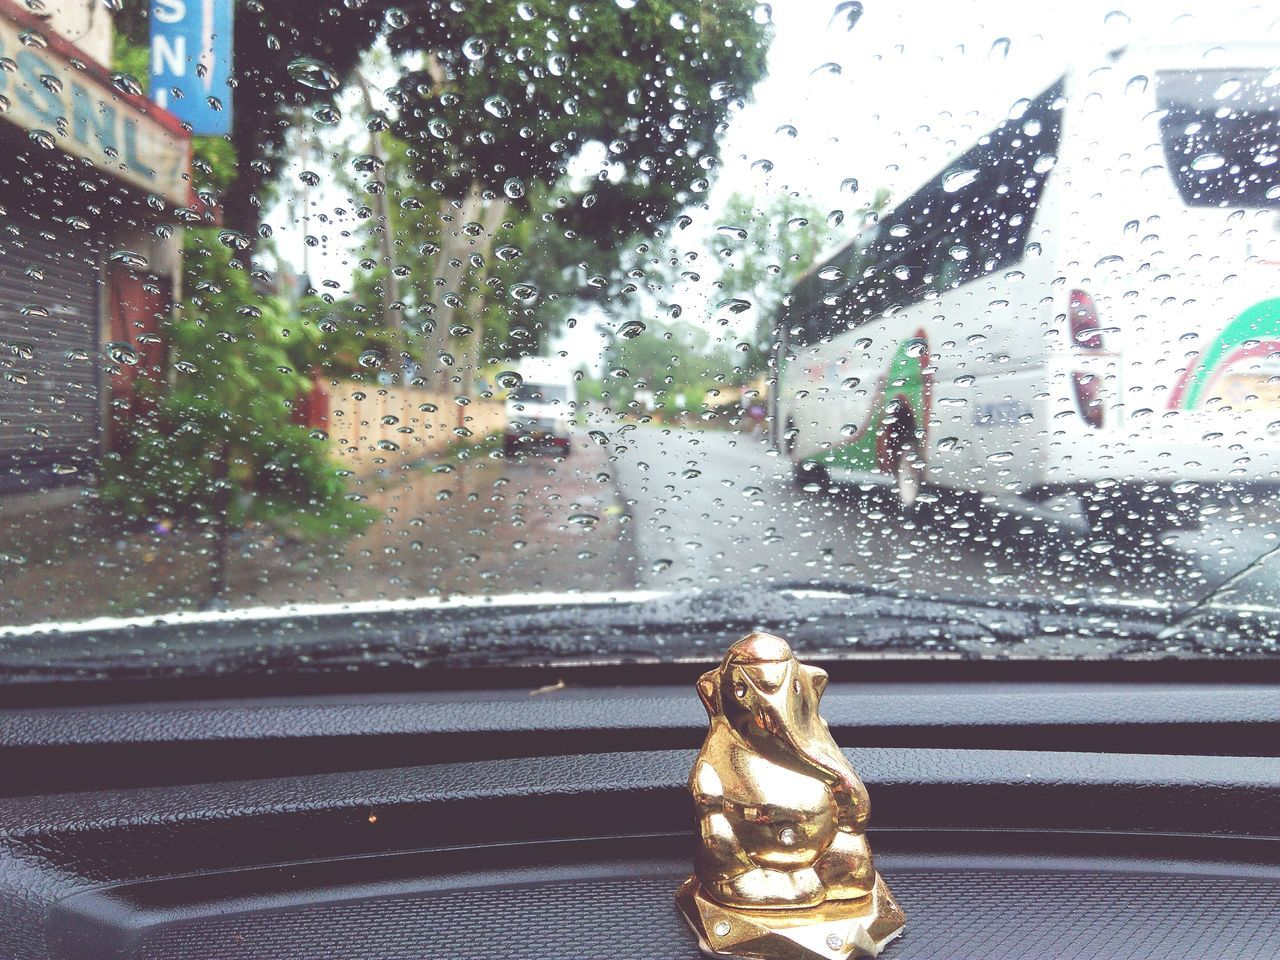 Glass - Material Window Car Transportation Car Interior Close-up RainDrop Raindrops Are Diamonds RainyDay Art Is Everywhere Lenevok5+ Beautiful Pictureoftheday EyeEmNewHere Eyemphotography Love To Take Photos ❤